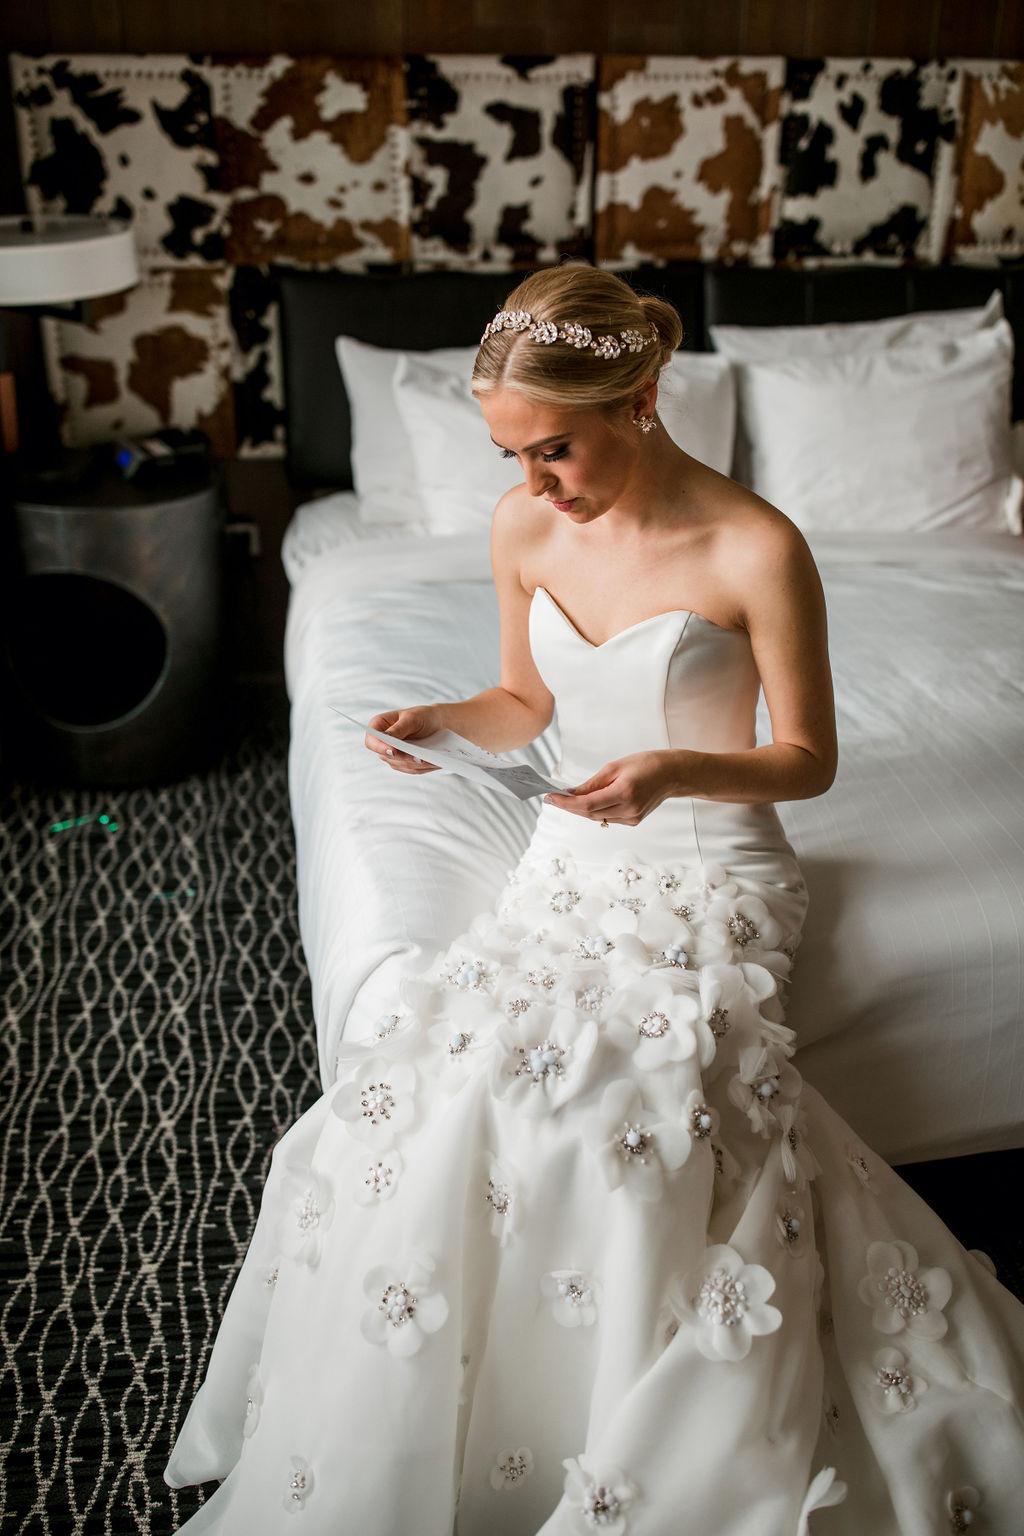 Bride reading letter from groom: Lavish Union Station Hotel Wedding featured on Nashville Bride Guide